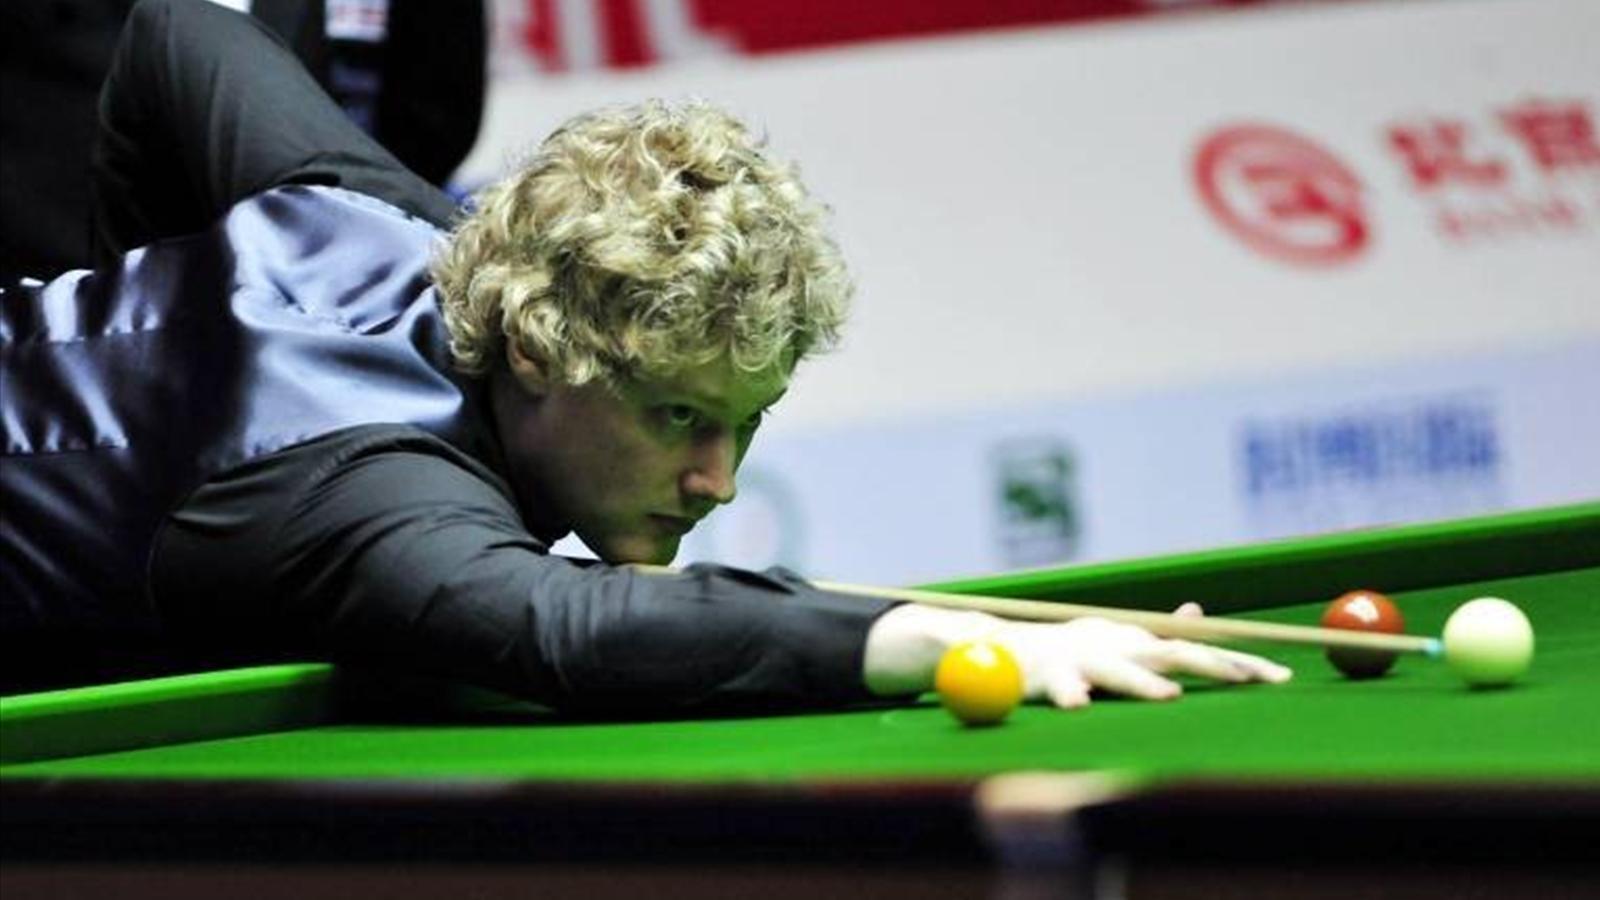 robertson beats cope - snooker - eurosport uk